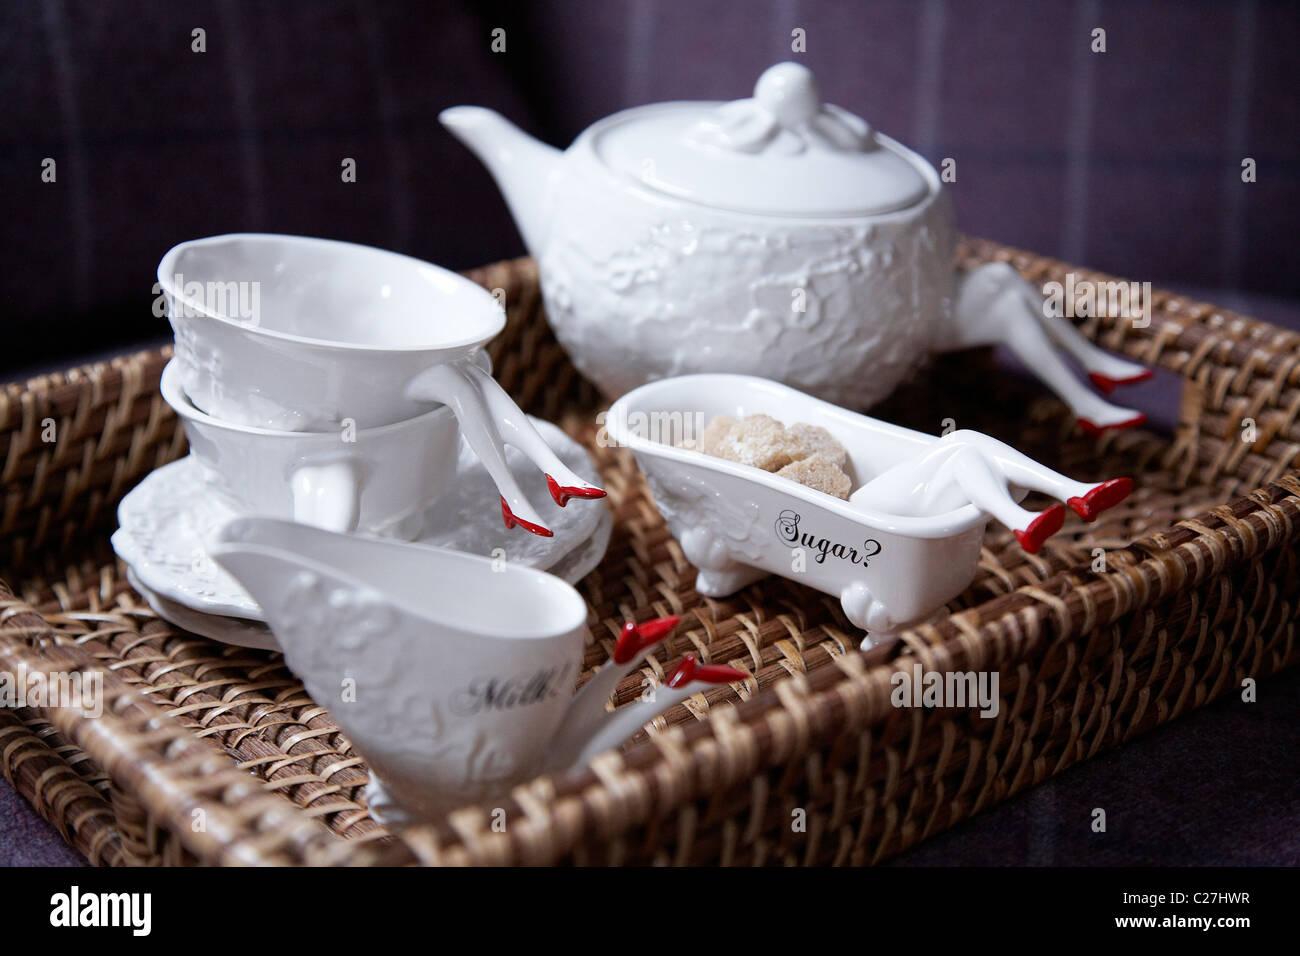 Blaue Blume tea set designed by Tina Tsang. - Stock Image